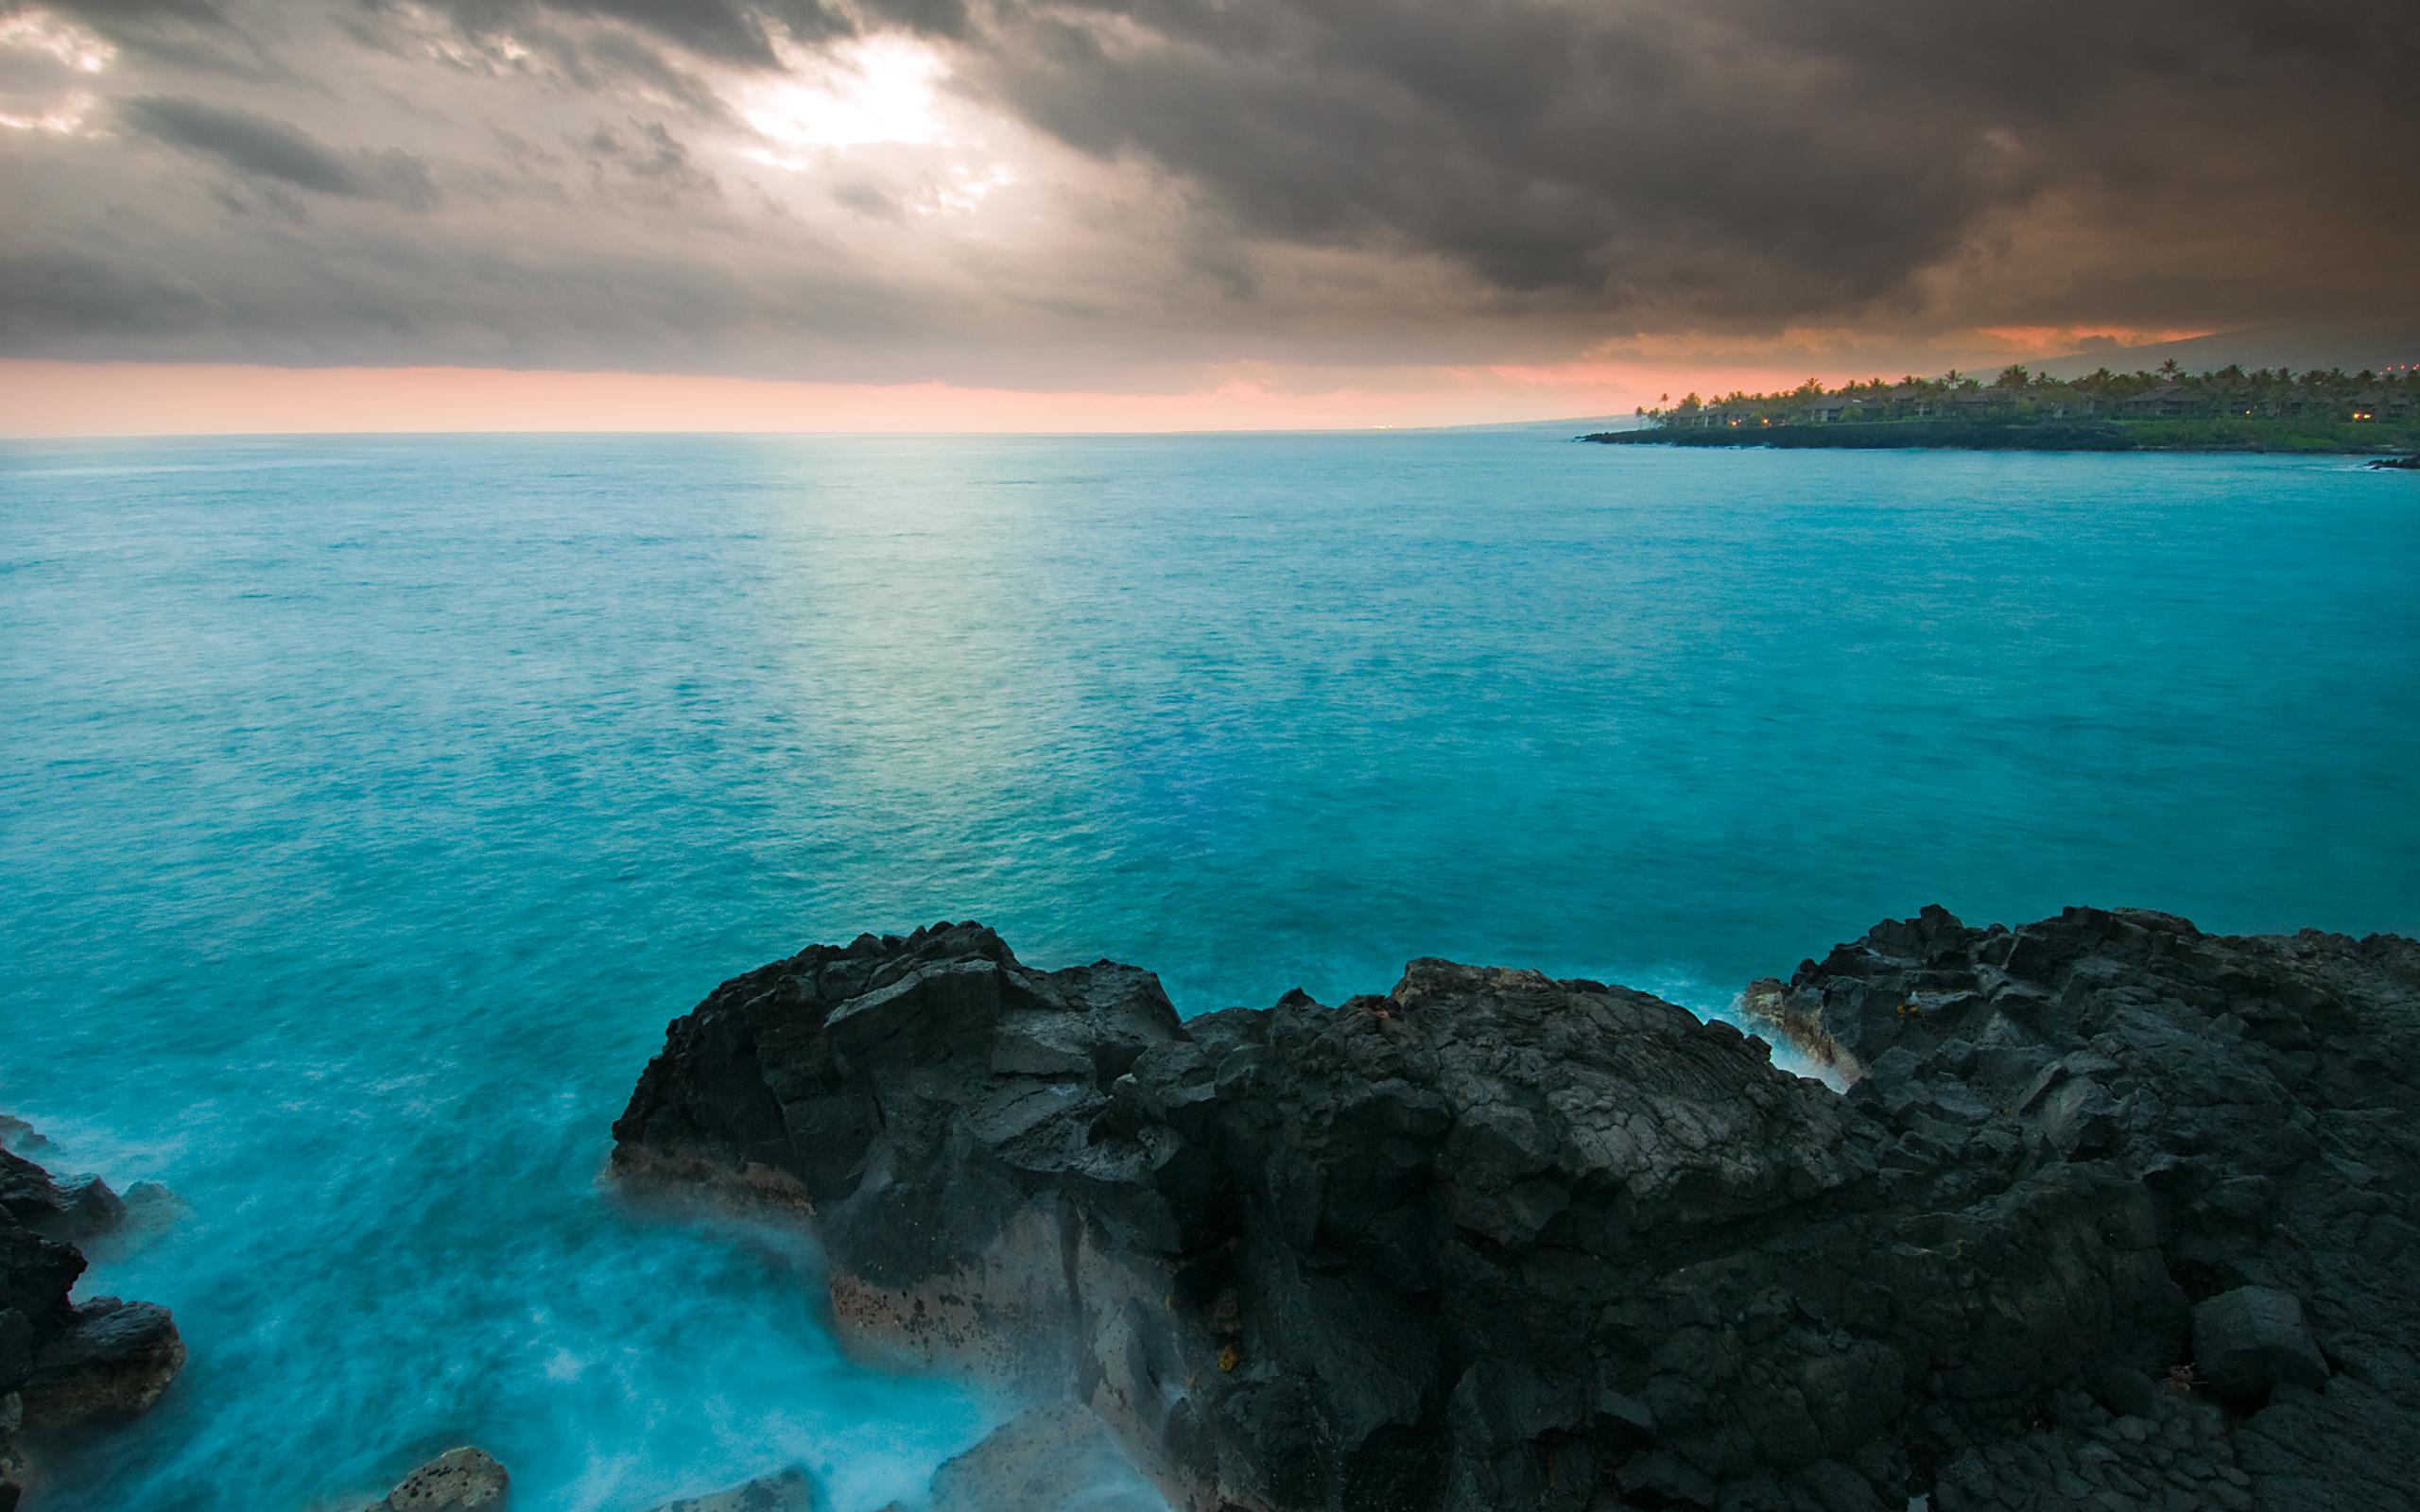 Island of Hawaii Wallpapers HD Wallpapers 2560x1600